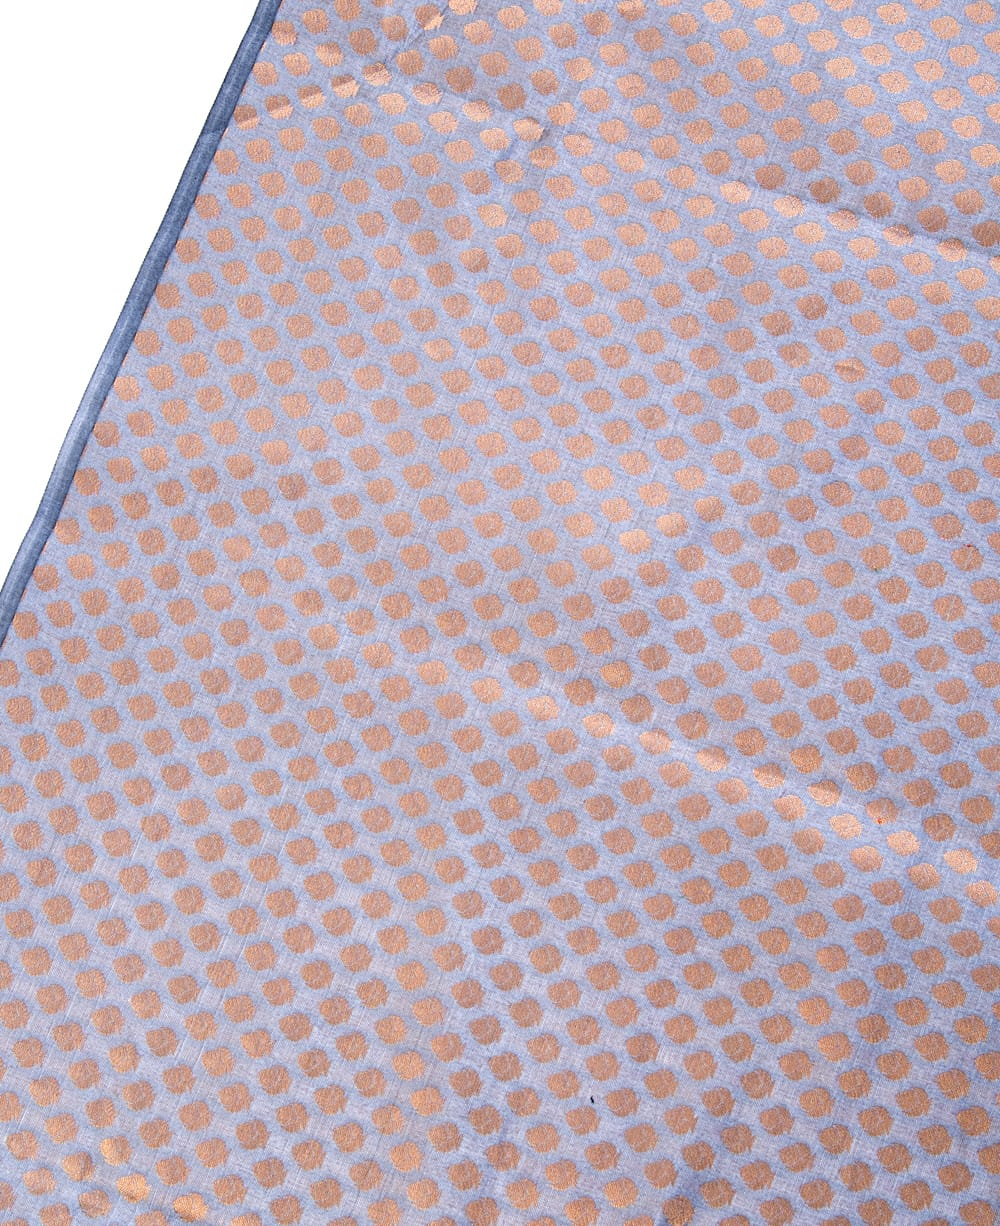 〔1m切り売り〕インドの伝統模様布〔幅約108cm〕 - グレー 3 - 拡大写真です。独特な雰囲気があります。